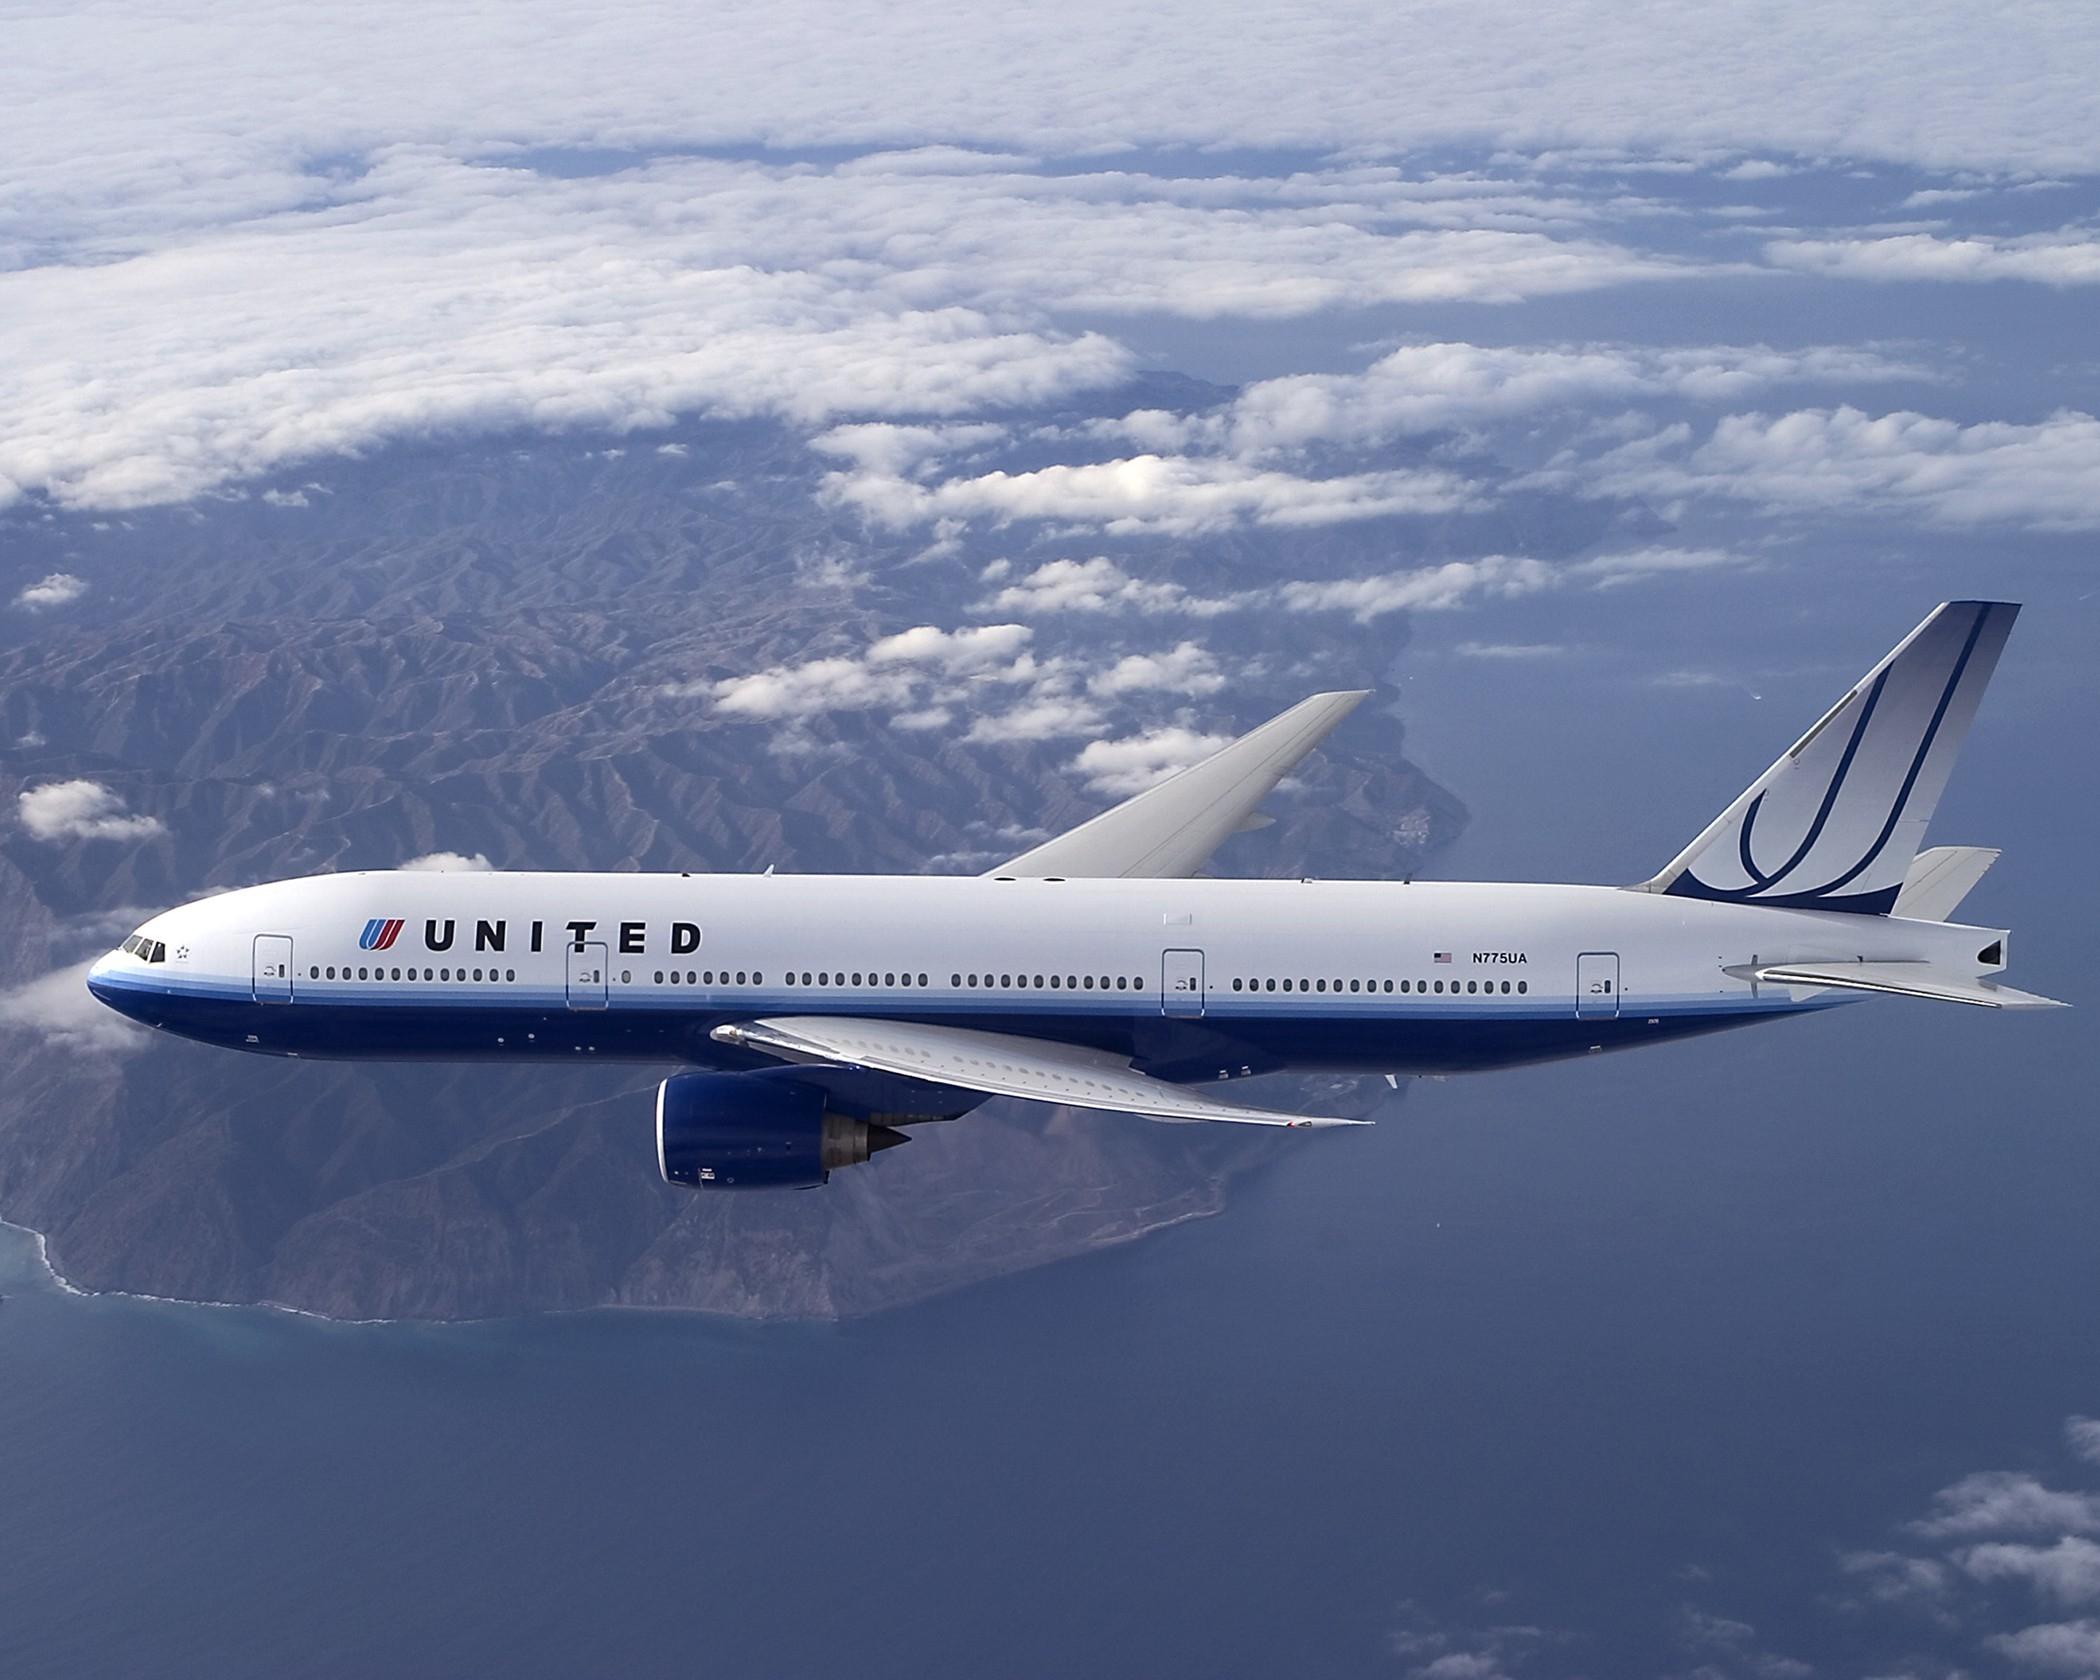 United plane